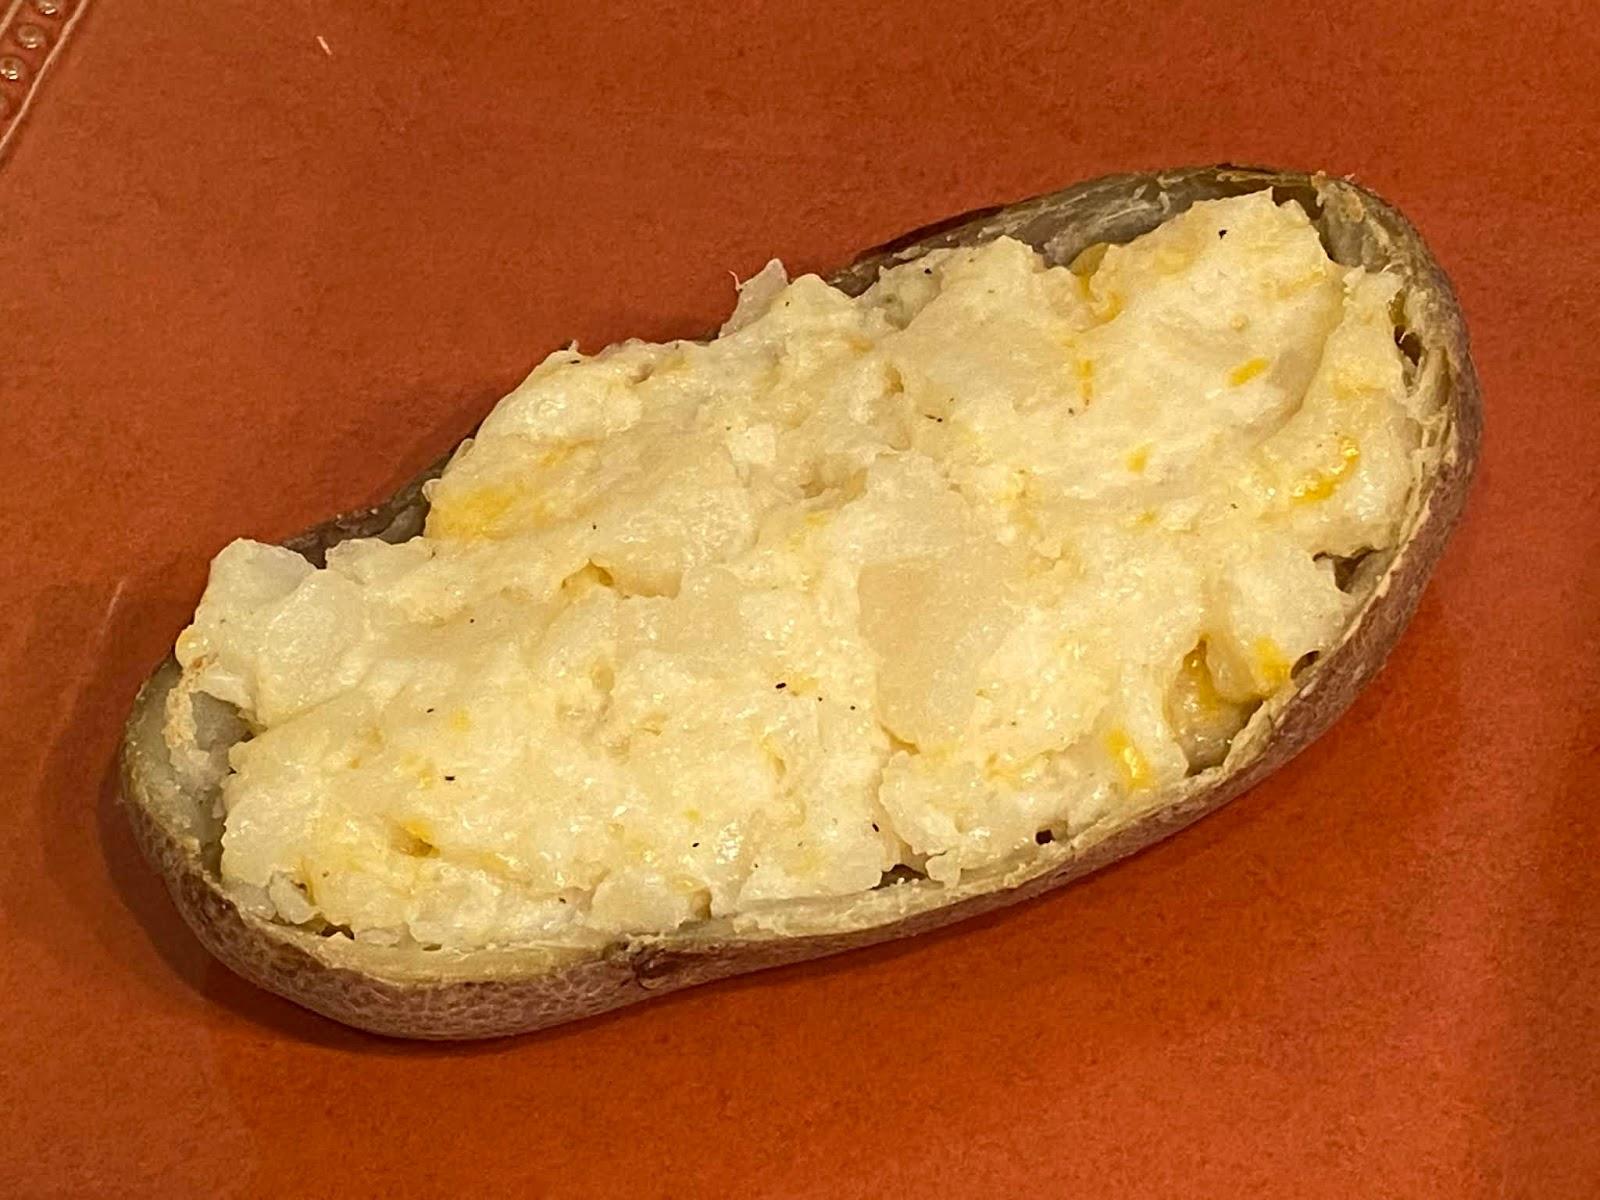 The Baker S Mann Twice Baked Potatoes